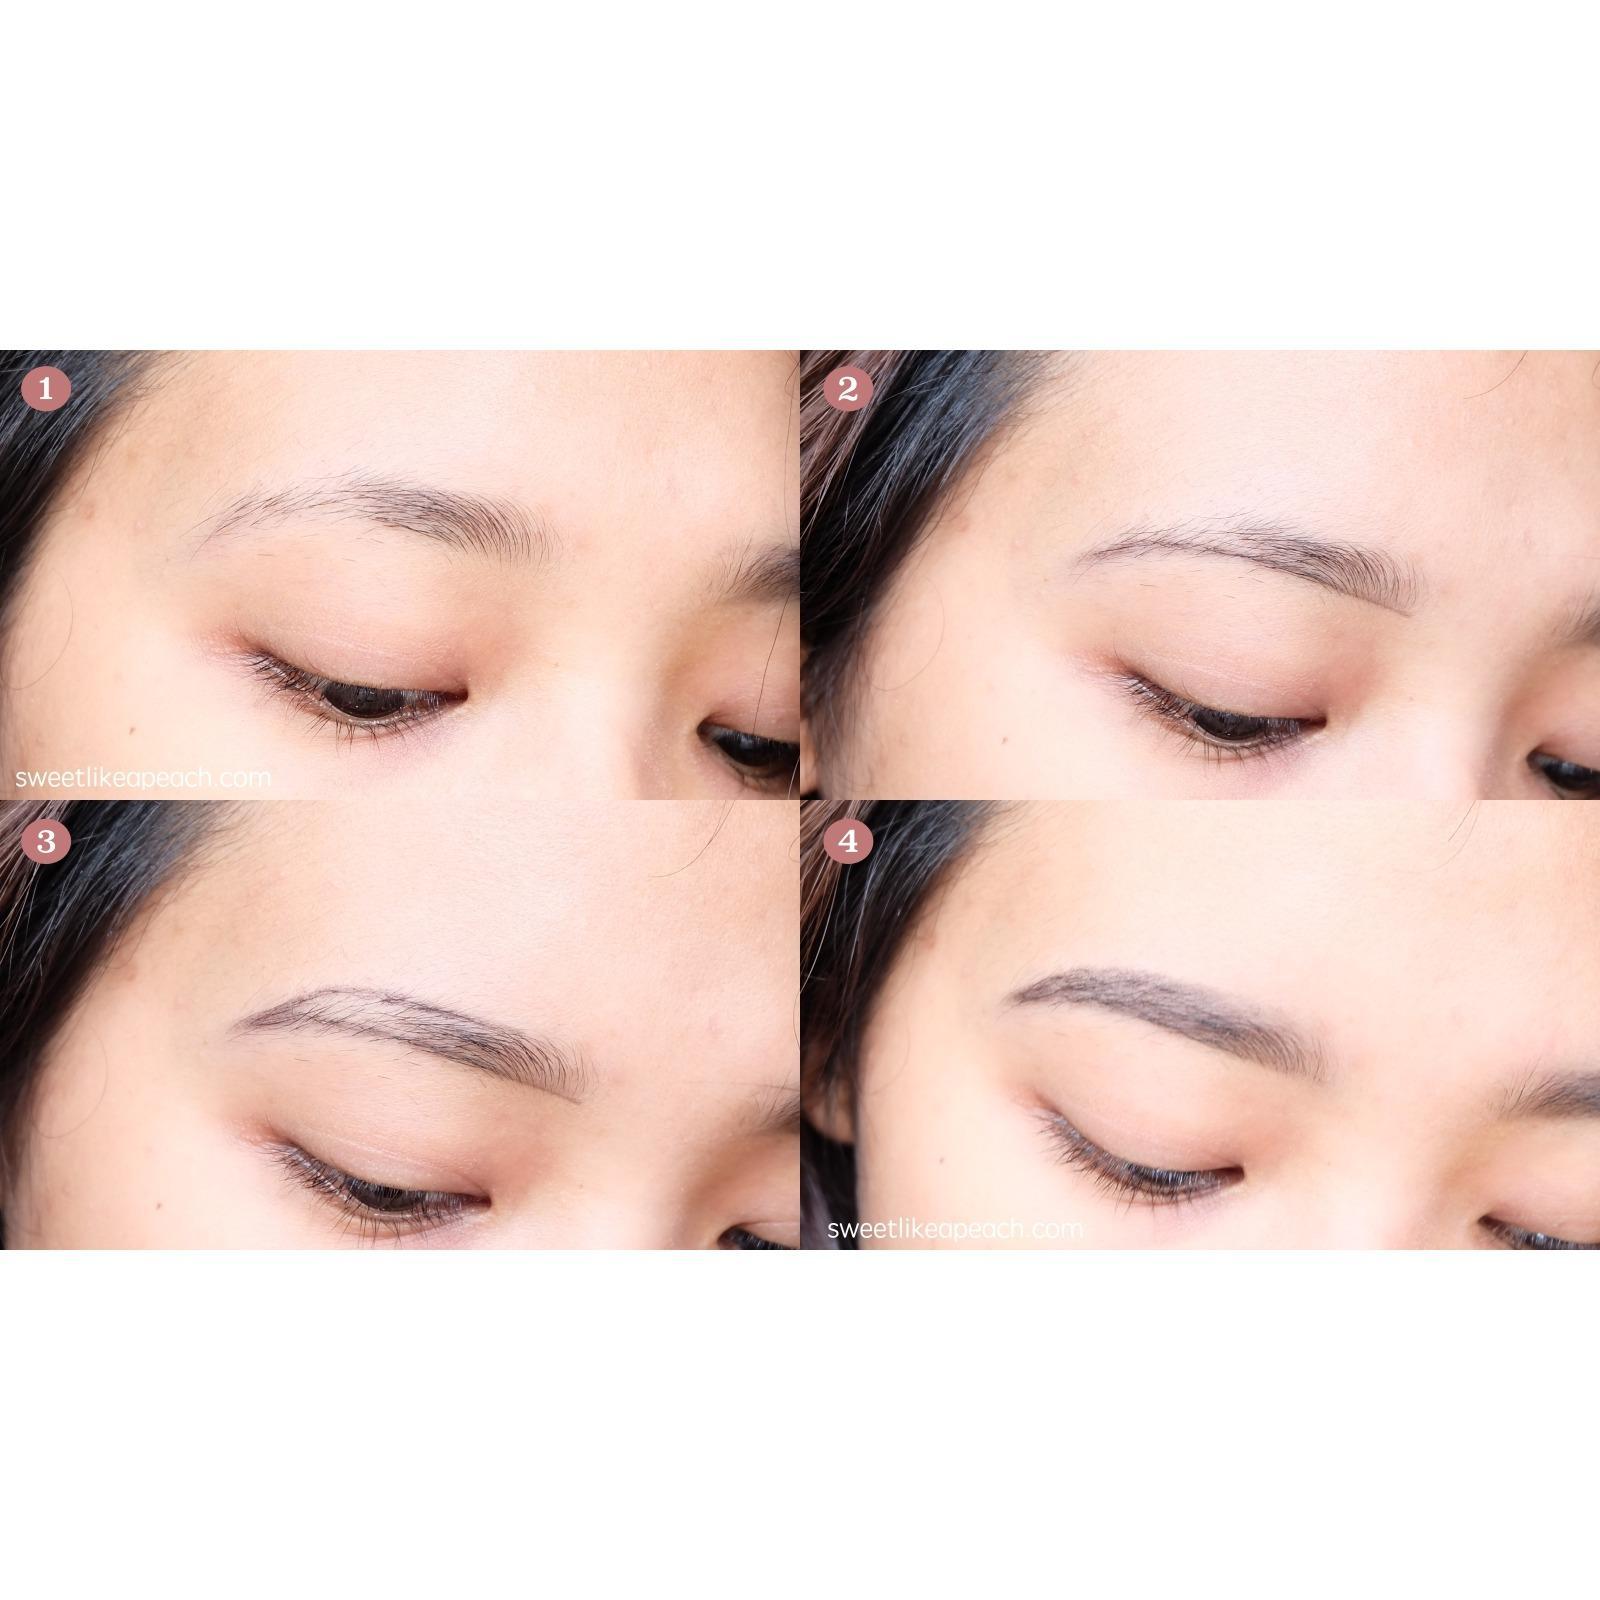 Fitur Etude House Drawing Eye Brow Eyebrow Pencil Brush Pensil Alis Set Sikat 3 Brown